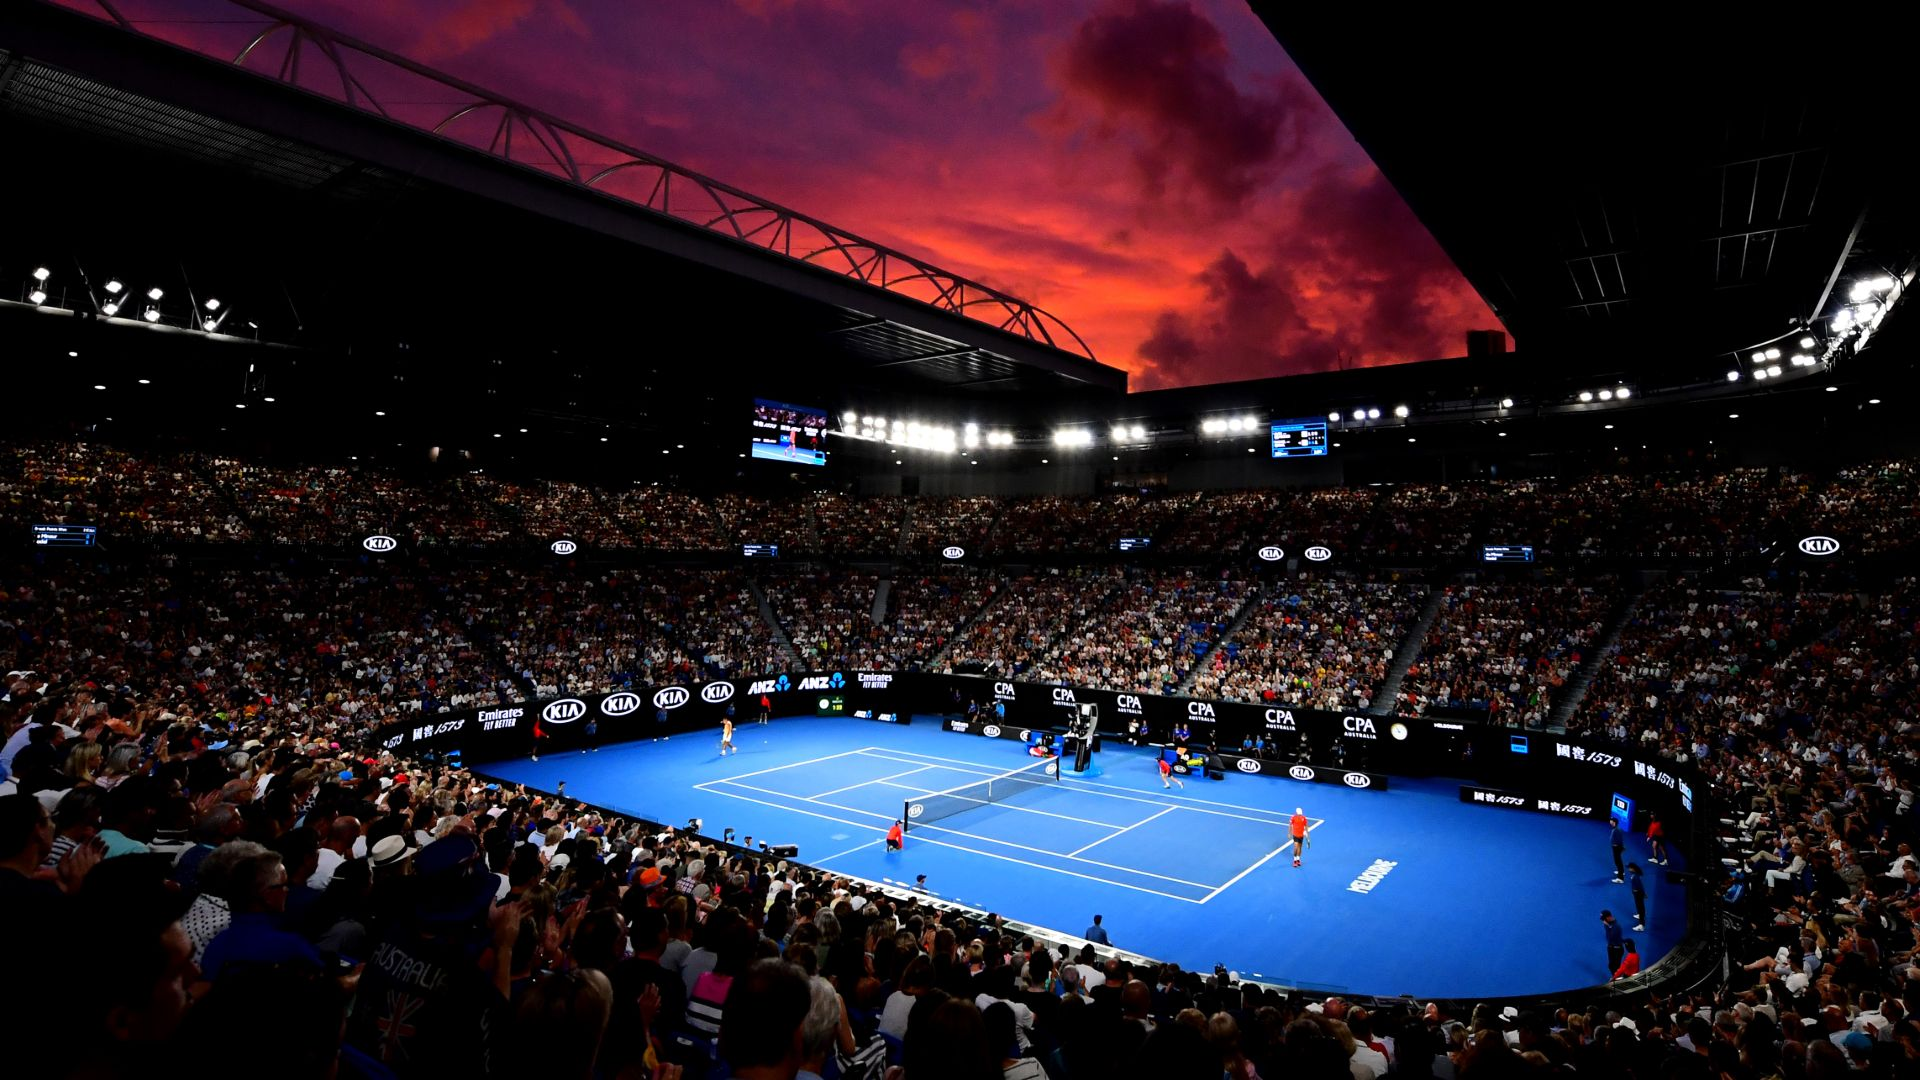 Australian Open 2021 - Rod Laver Arena